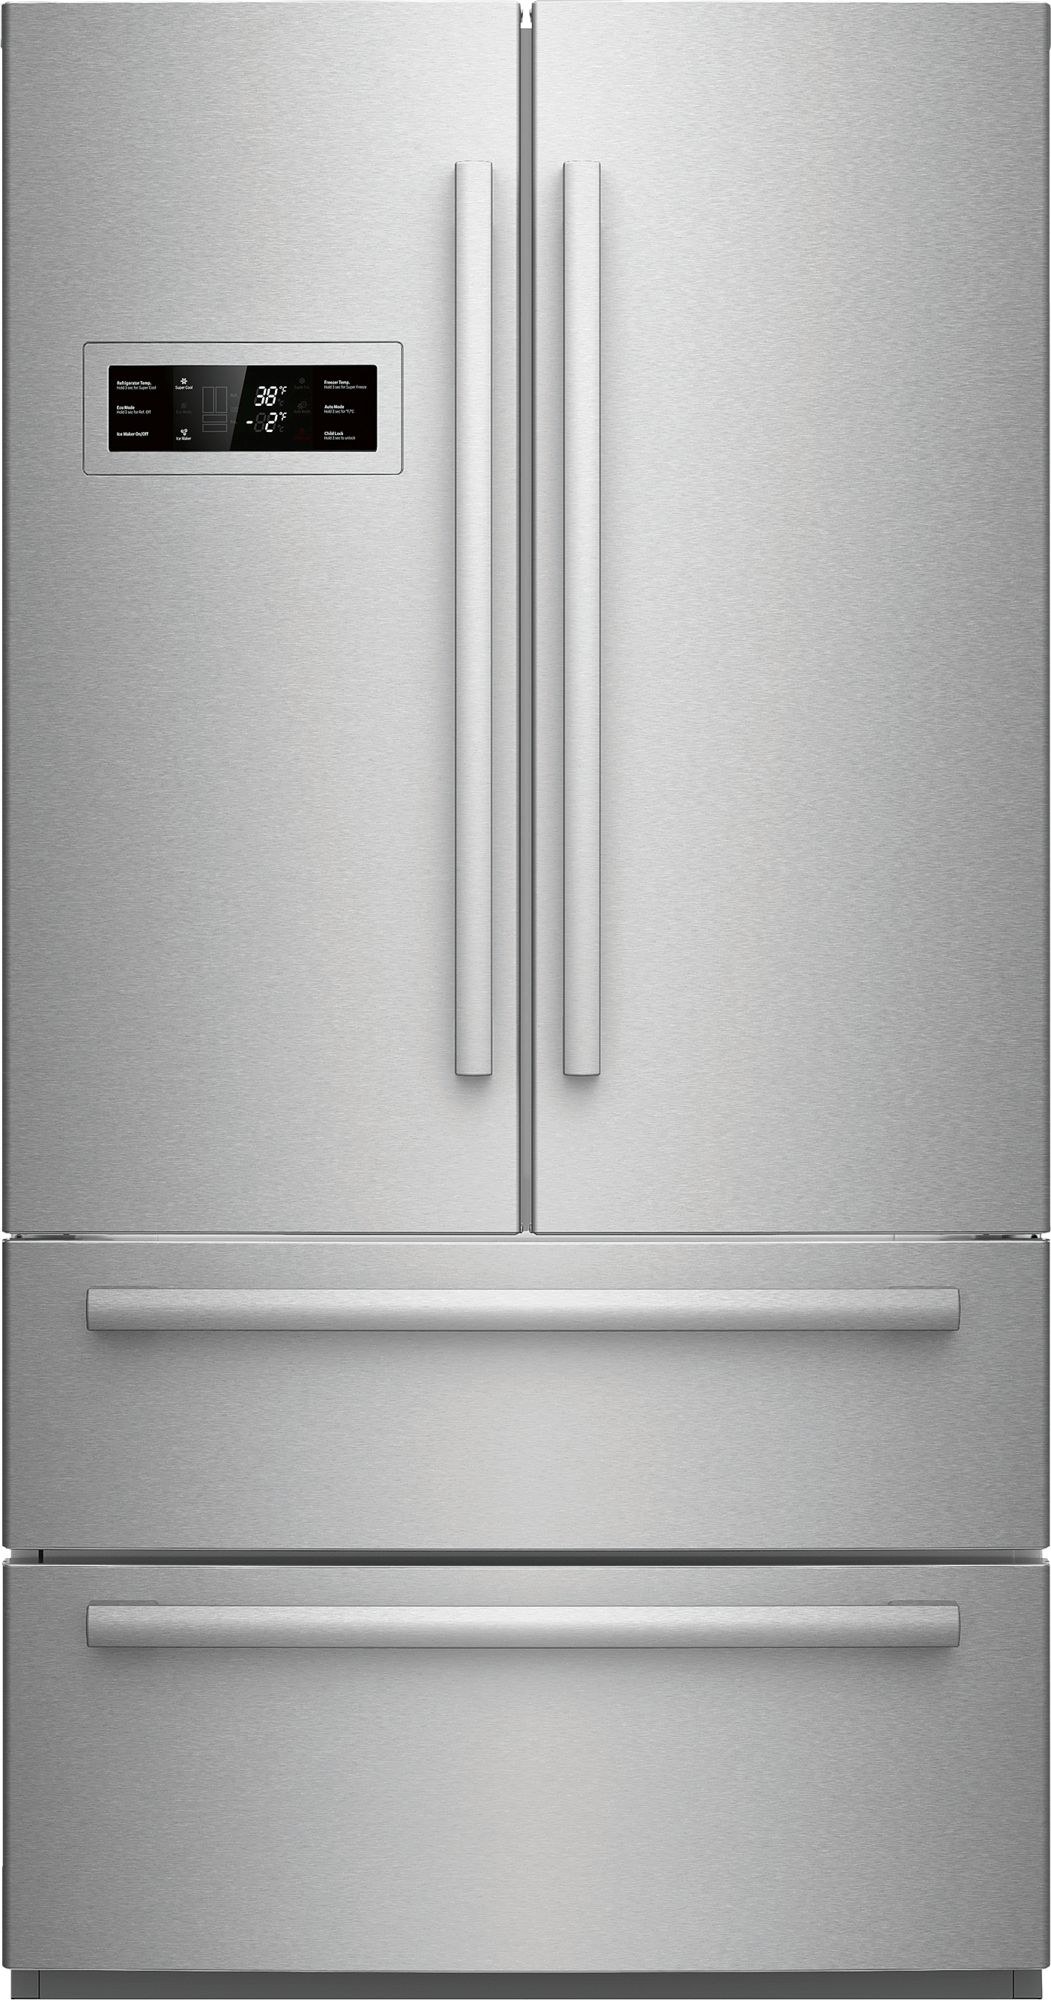 Superior Bosch 800 Series 20.7 Cu. Ft. Counter Depth French Door  Refrigerator Stainless Steel ...